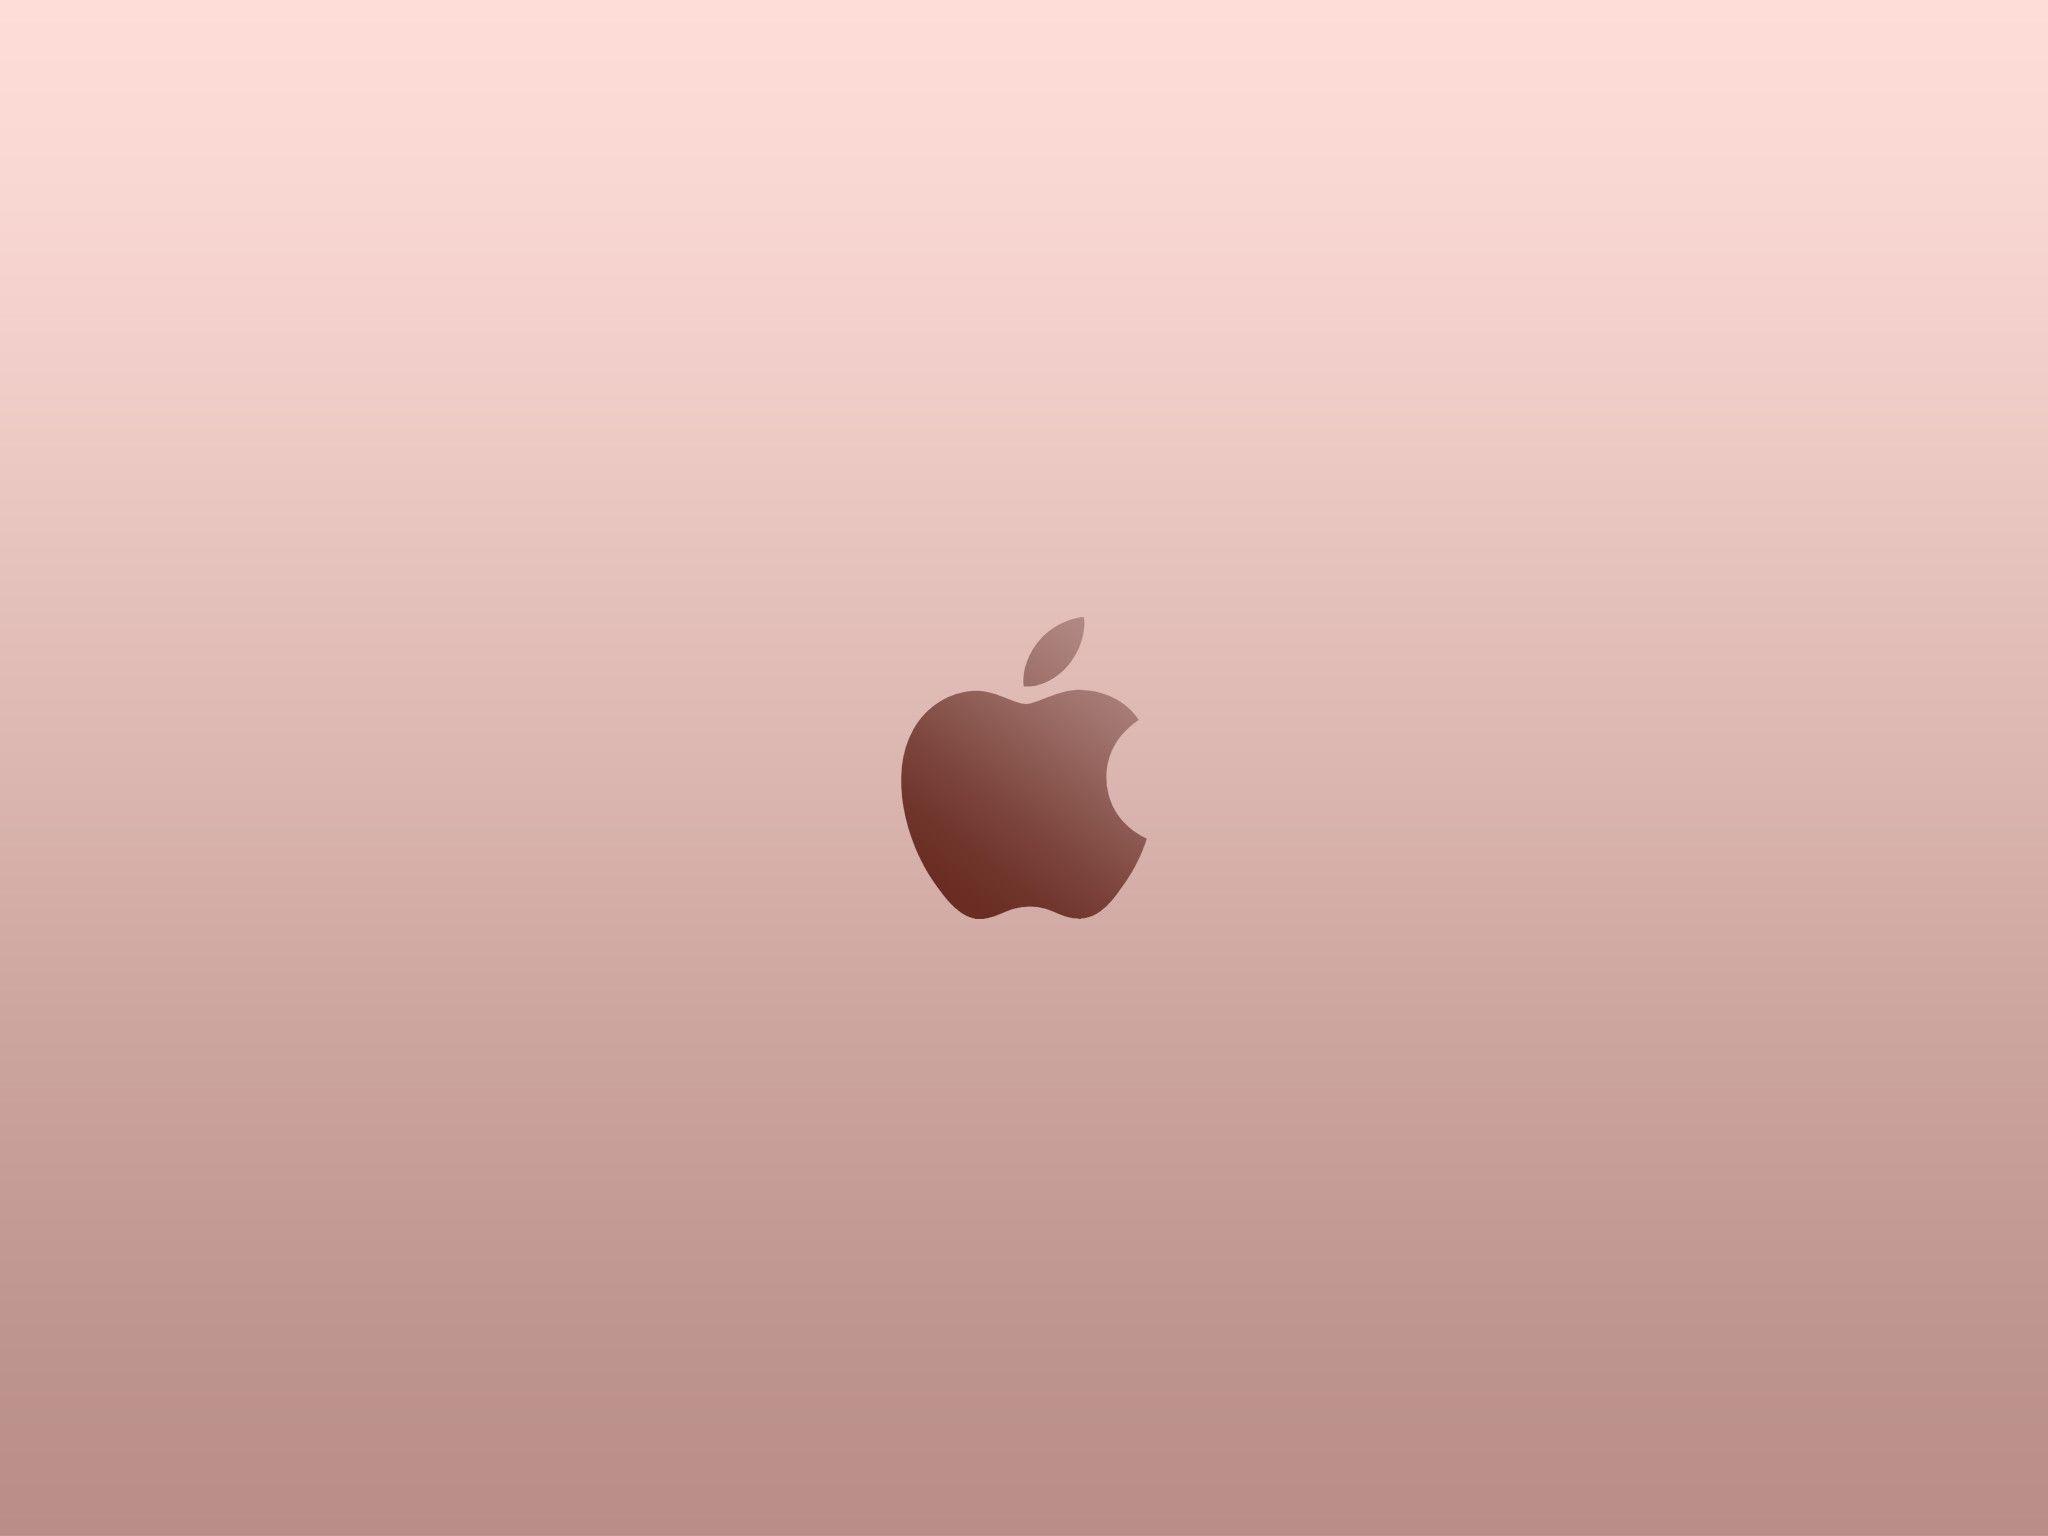 2048x1536 Apple Logo Rose Gold Wallpaper By Superquanganh